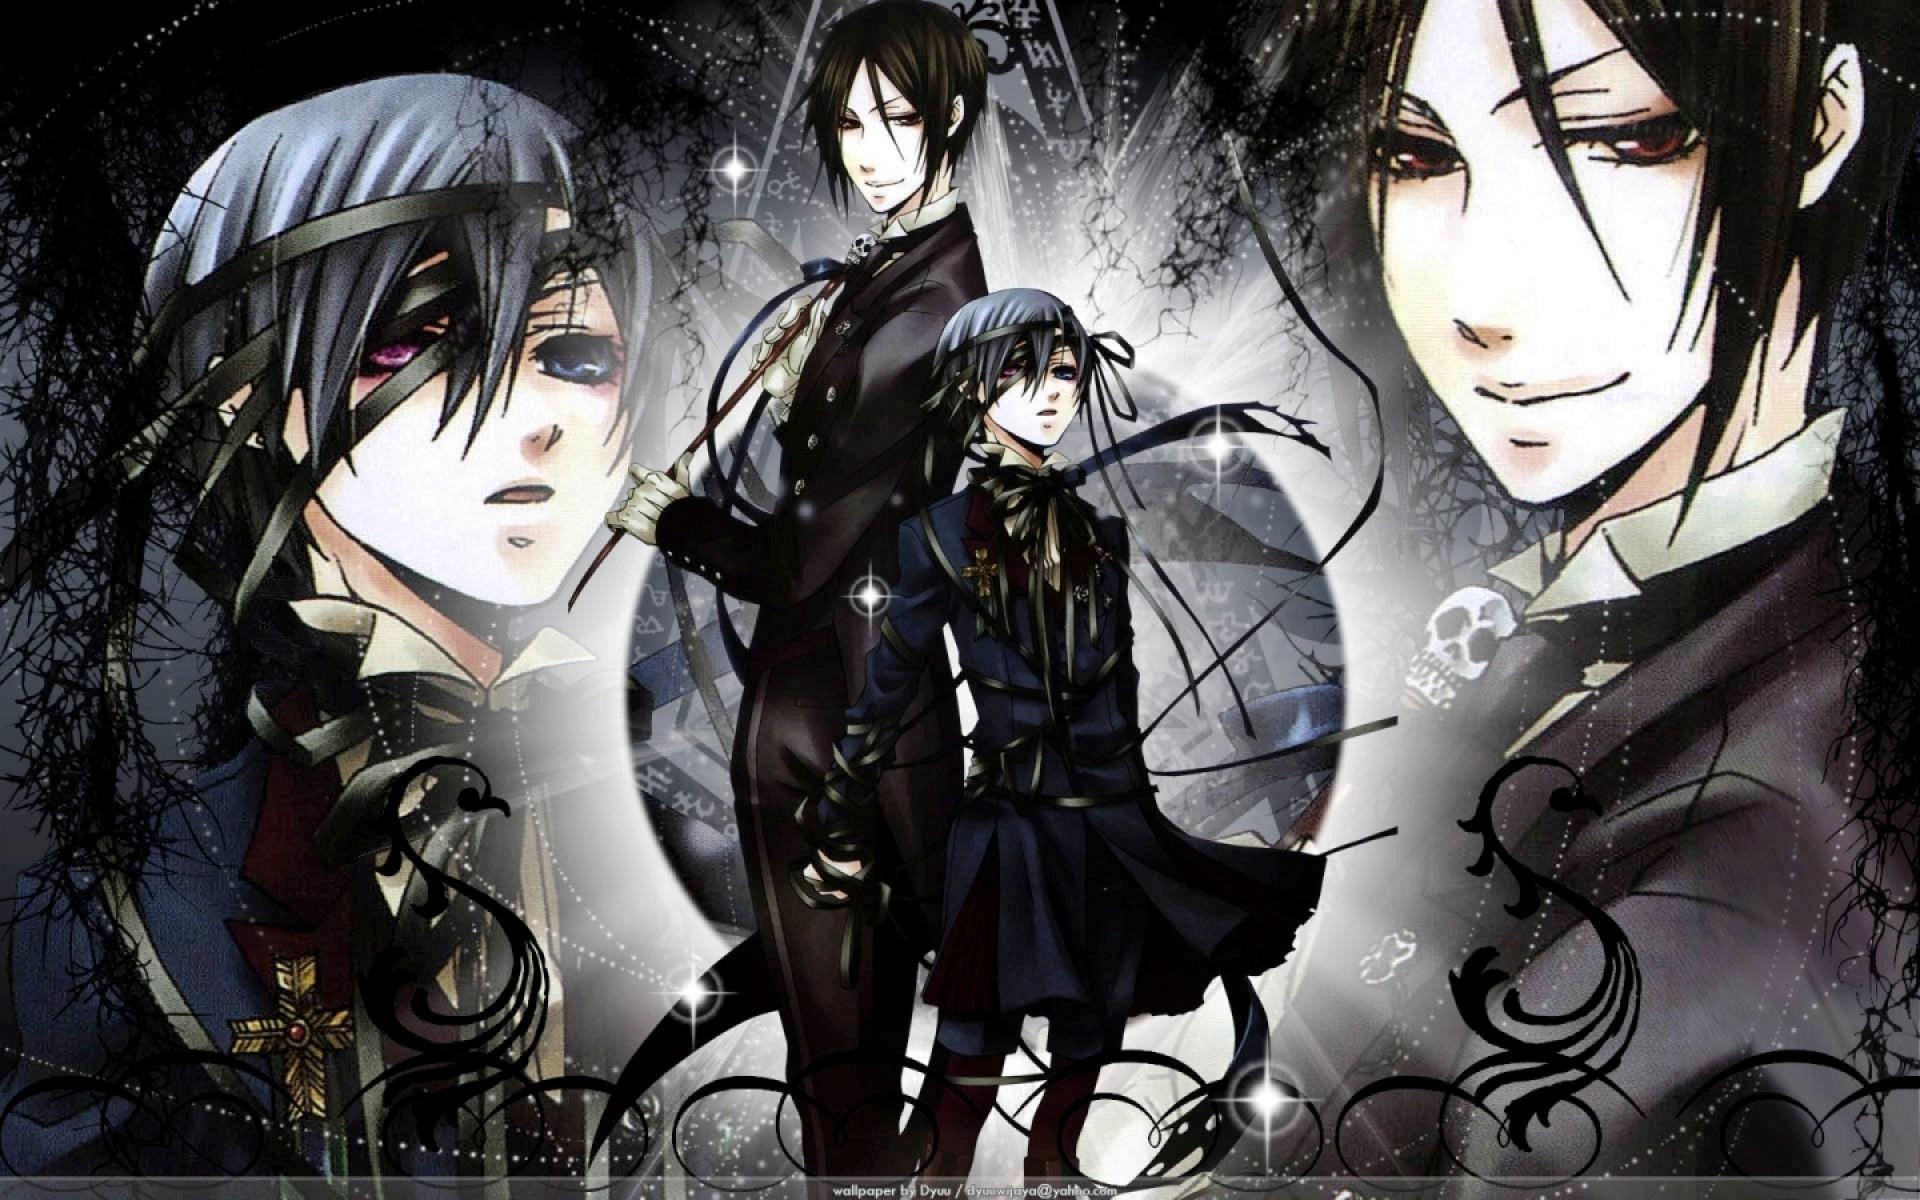 Illustration Anime Comics Kuroshitsuji Michaelis Sebastian Ciel Phantomhive Black Butler Mangaka Comic Book